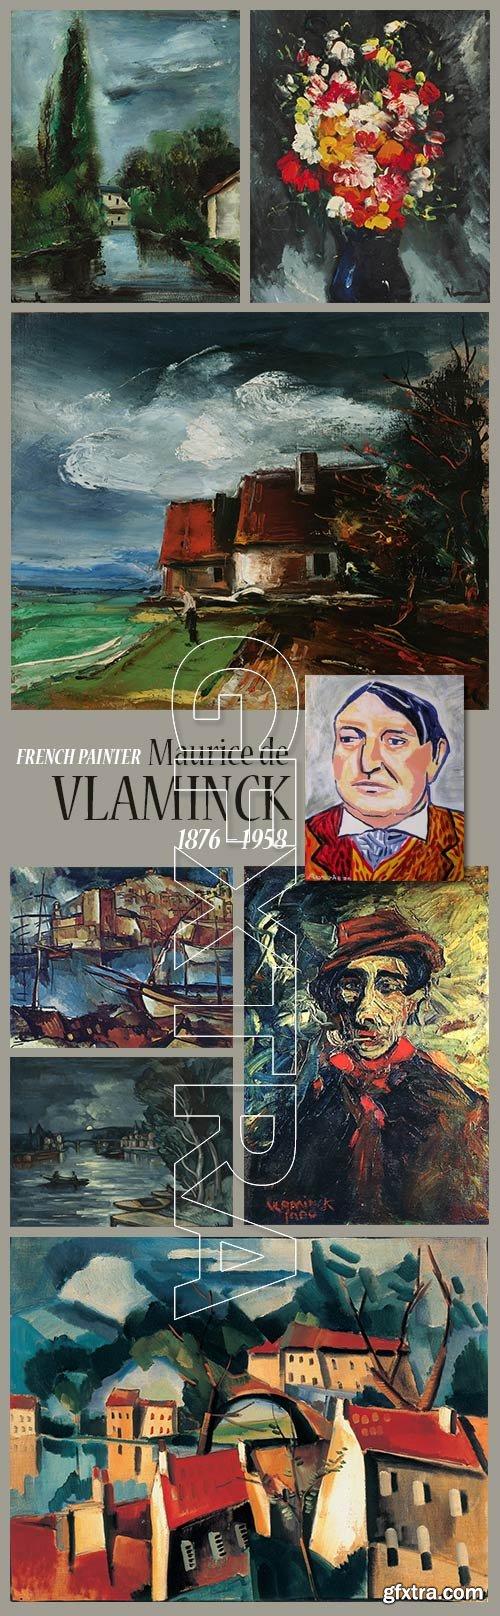 Maurice de Vlaminck, French Painter (1876–1958)